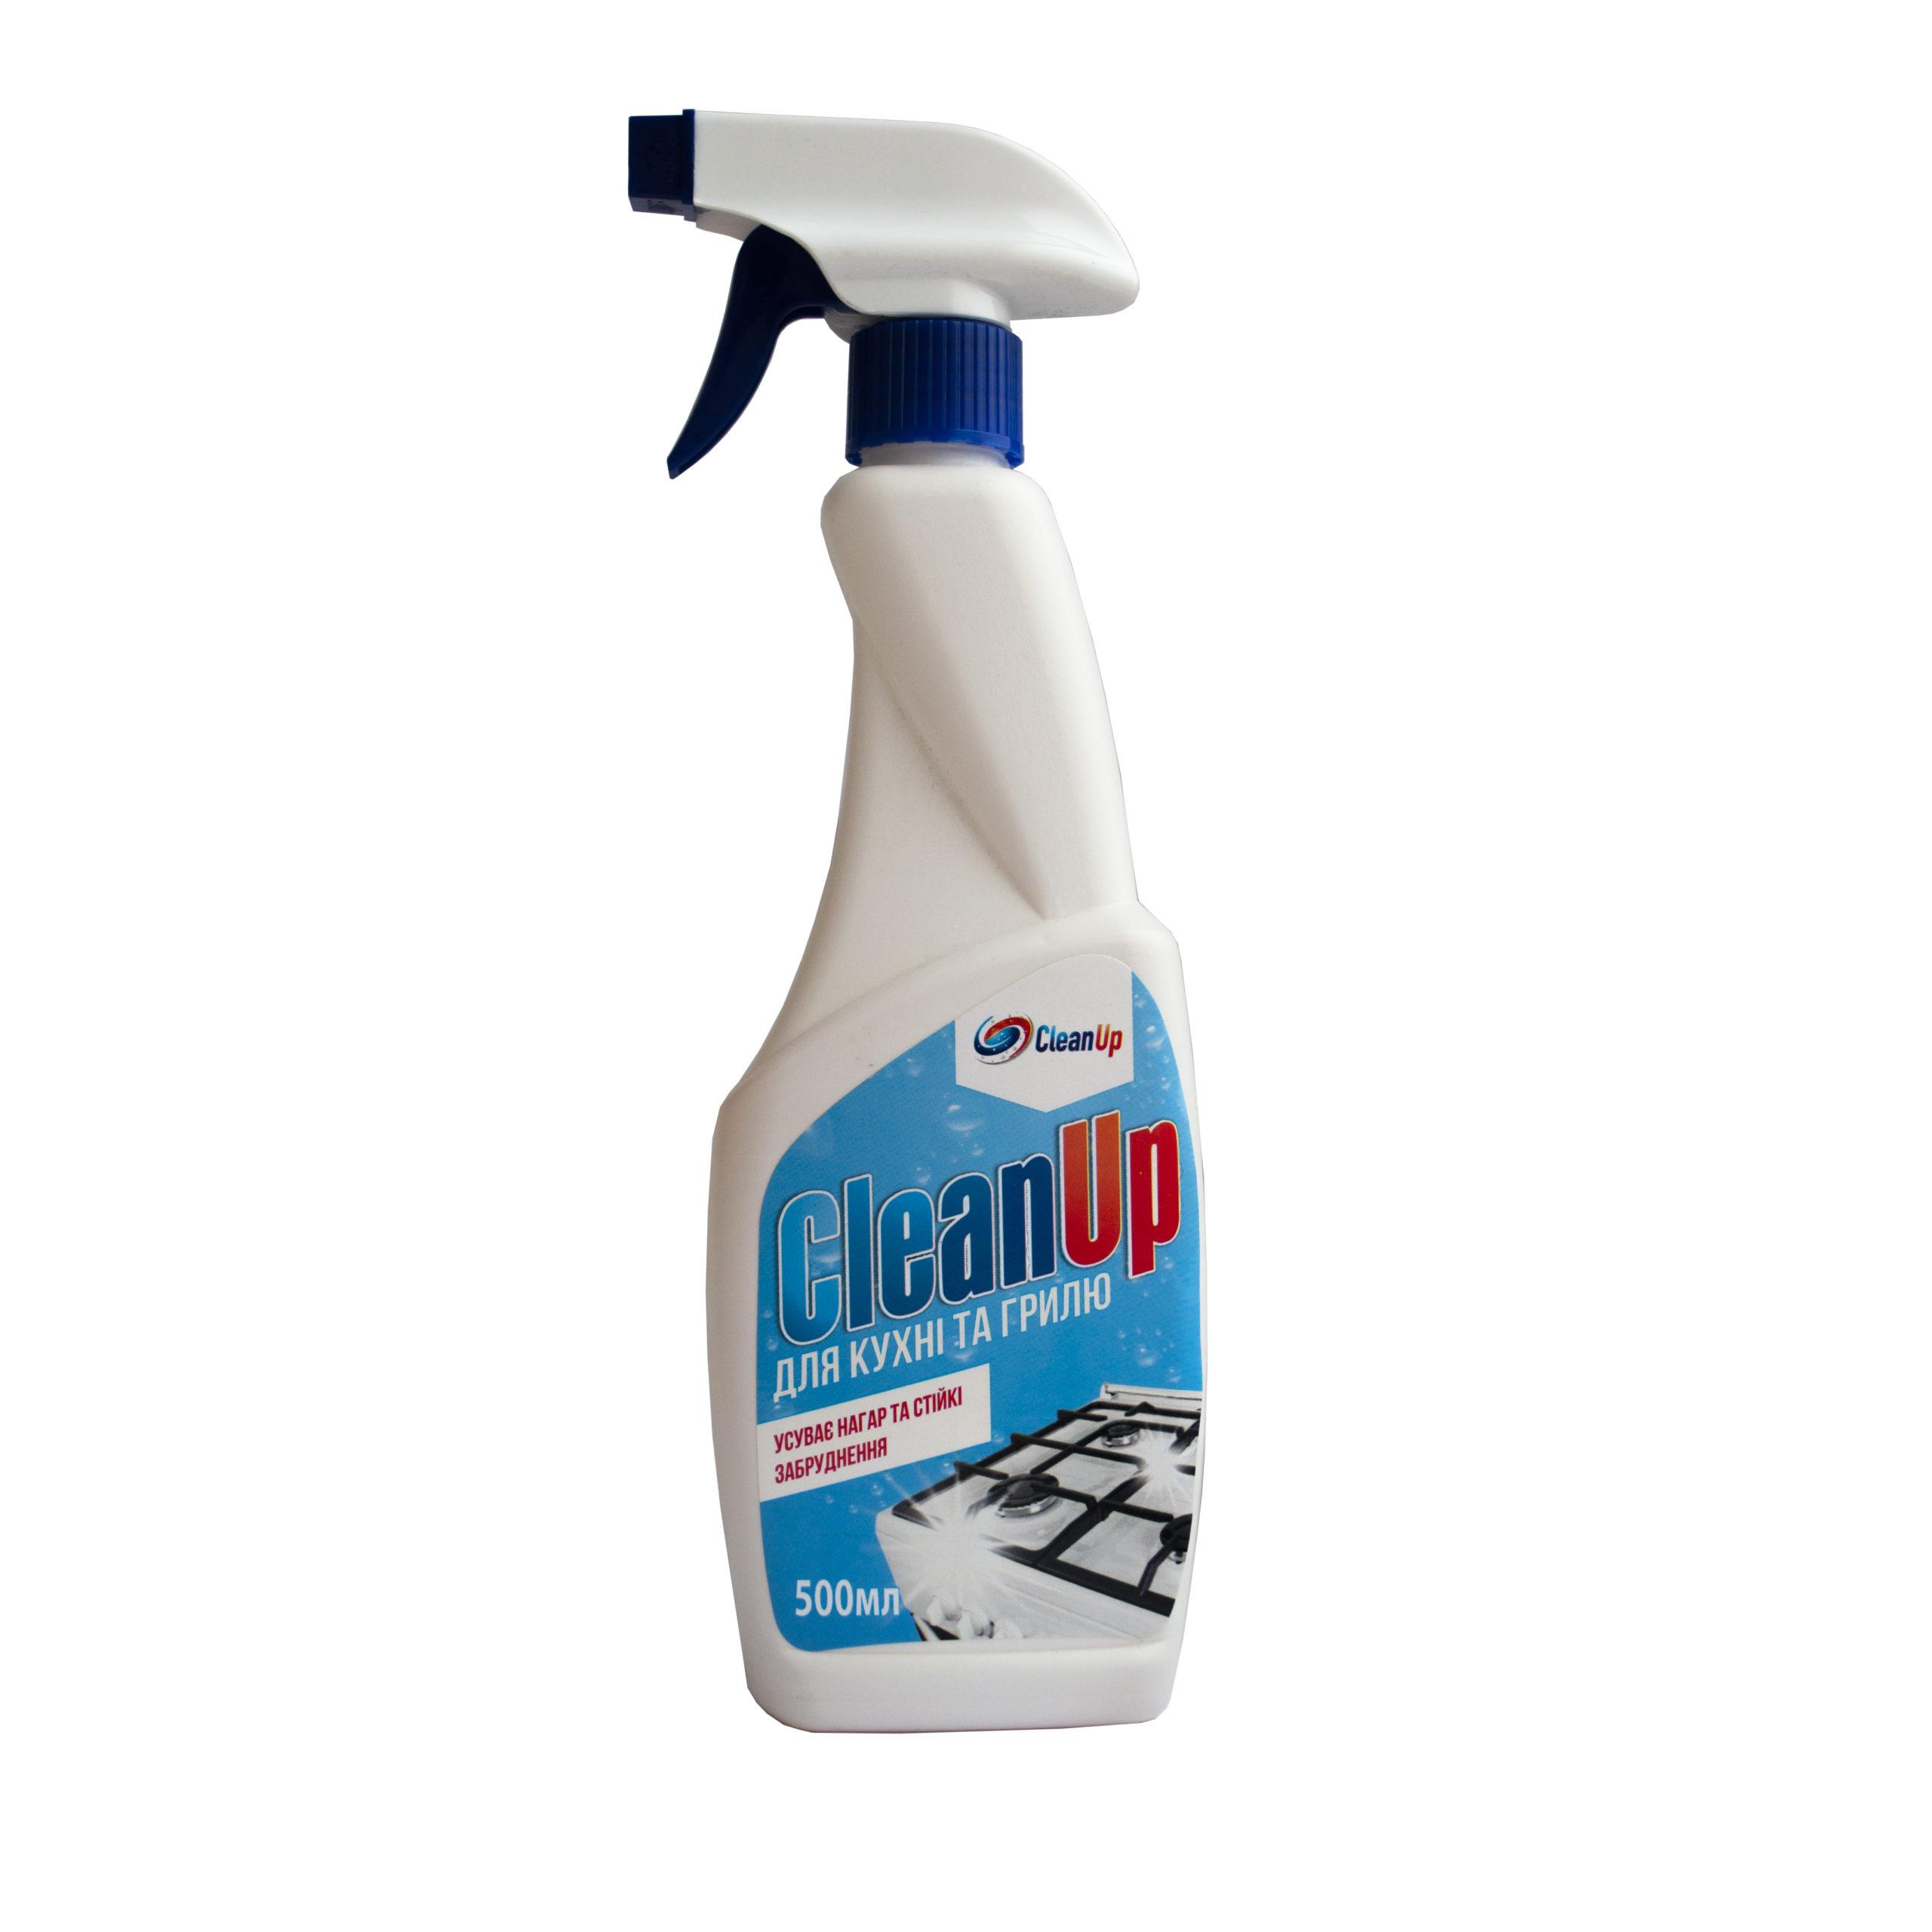 Clean Up Засіб д/ч кухні  500г з трігером